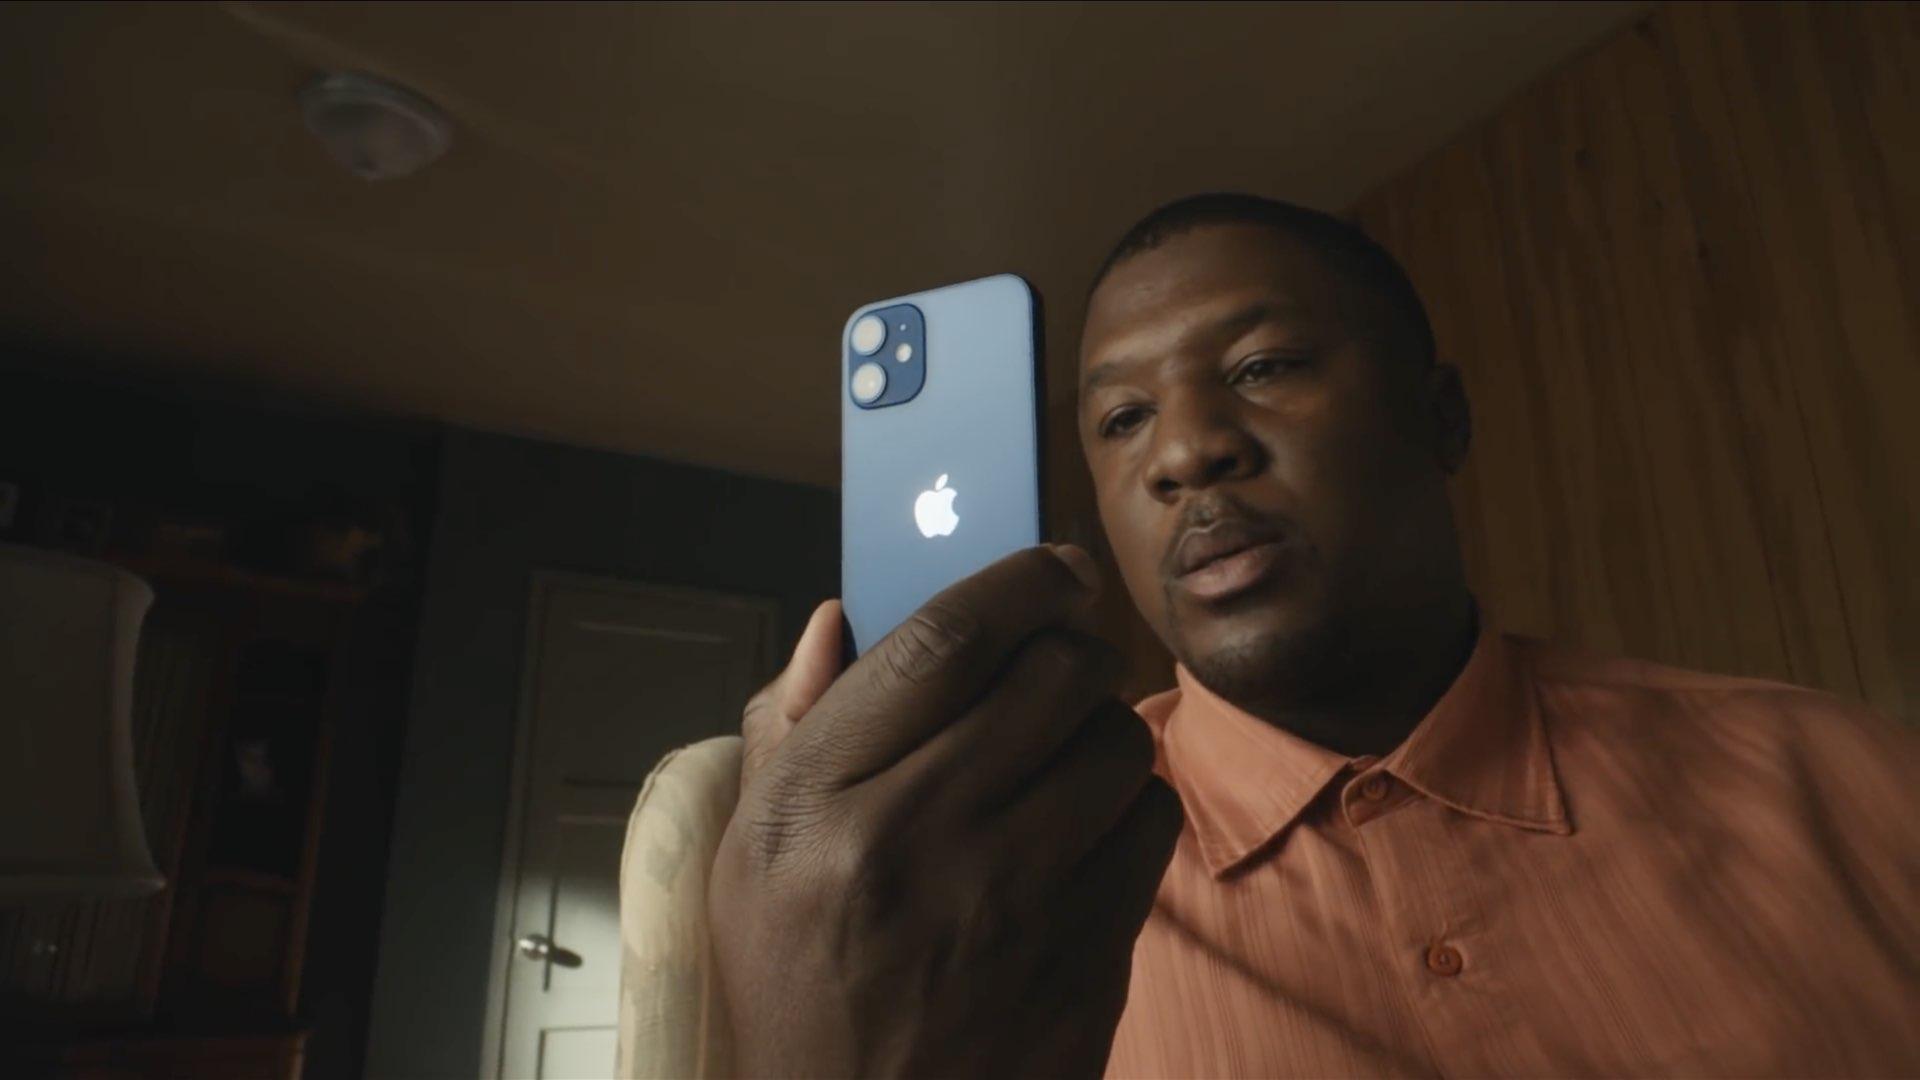 iPhone-12-mini-in-hand-001-1.jpg